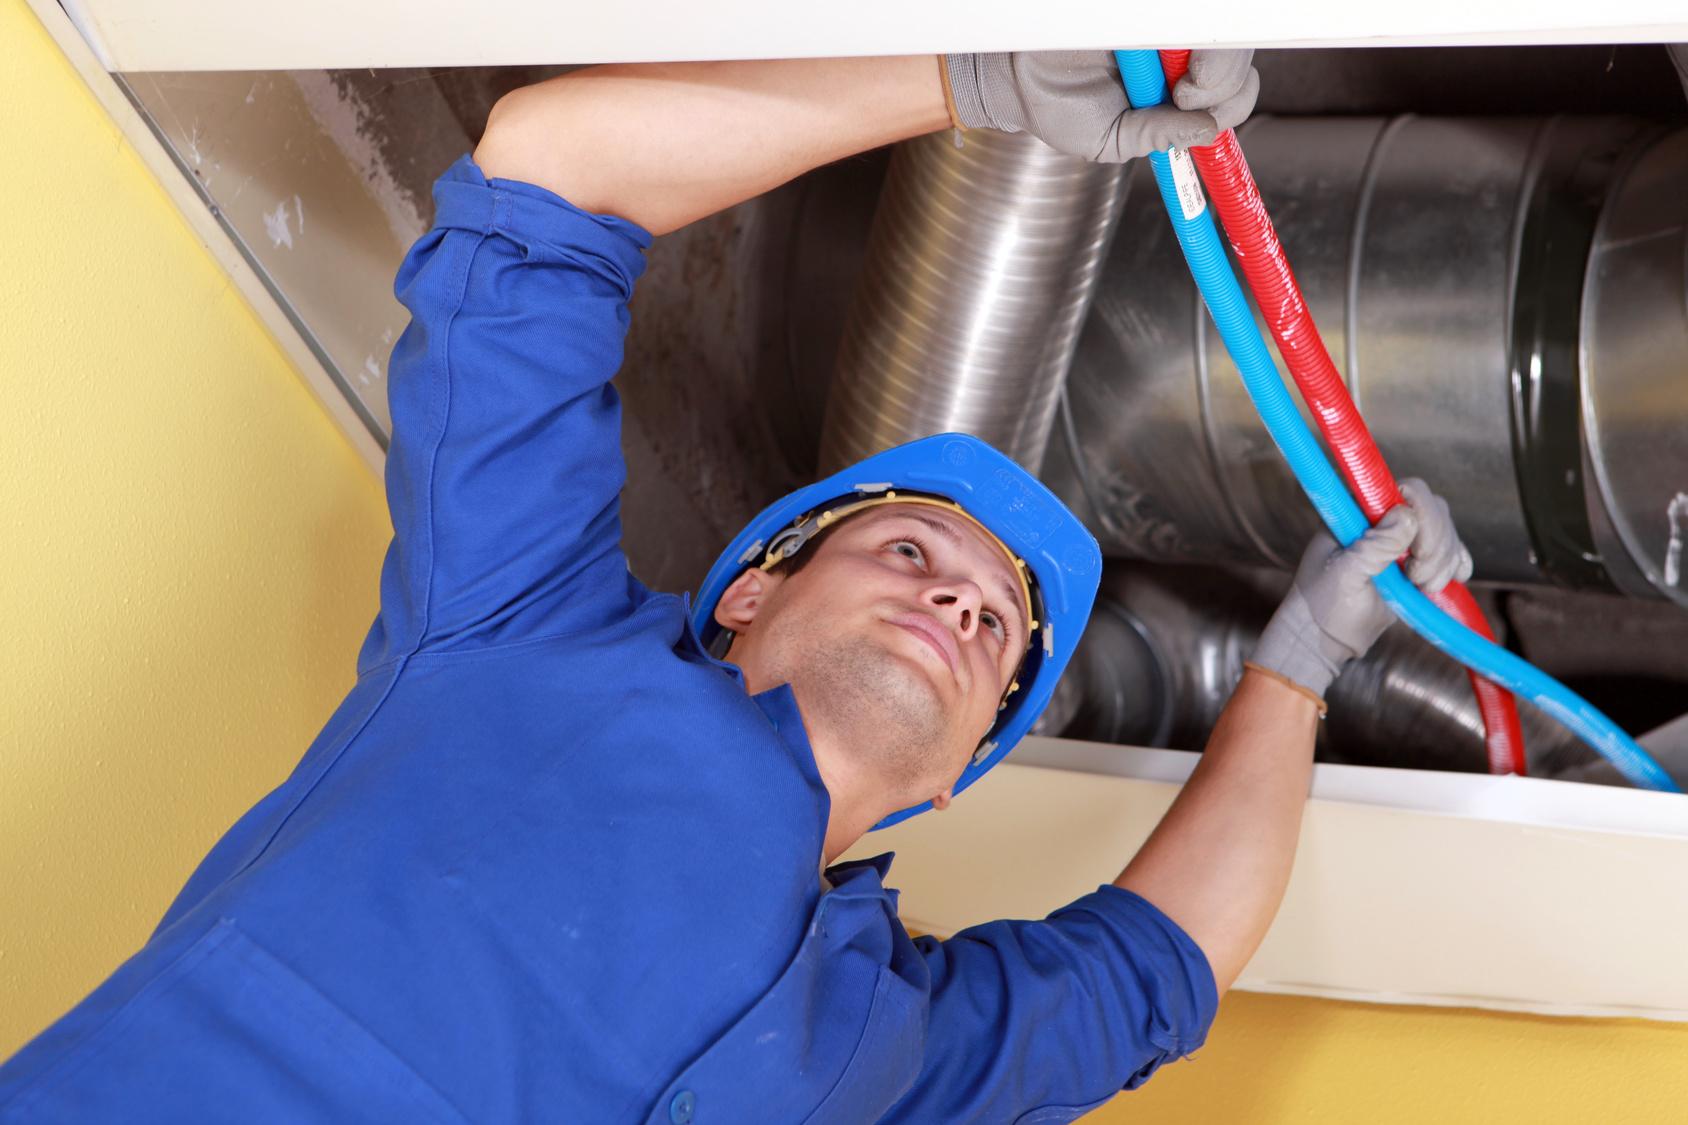 Работа по монтажу системы вентиляции